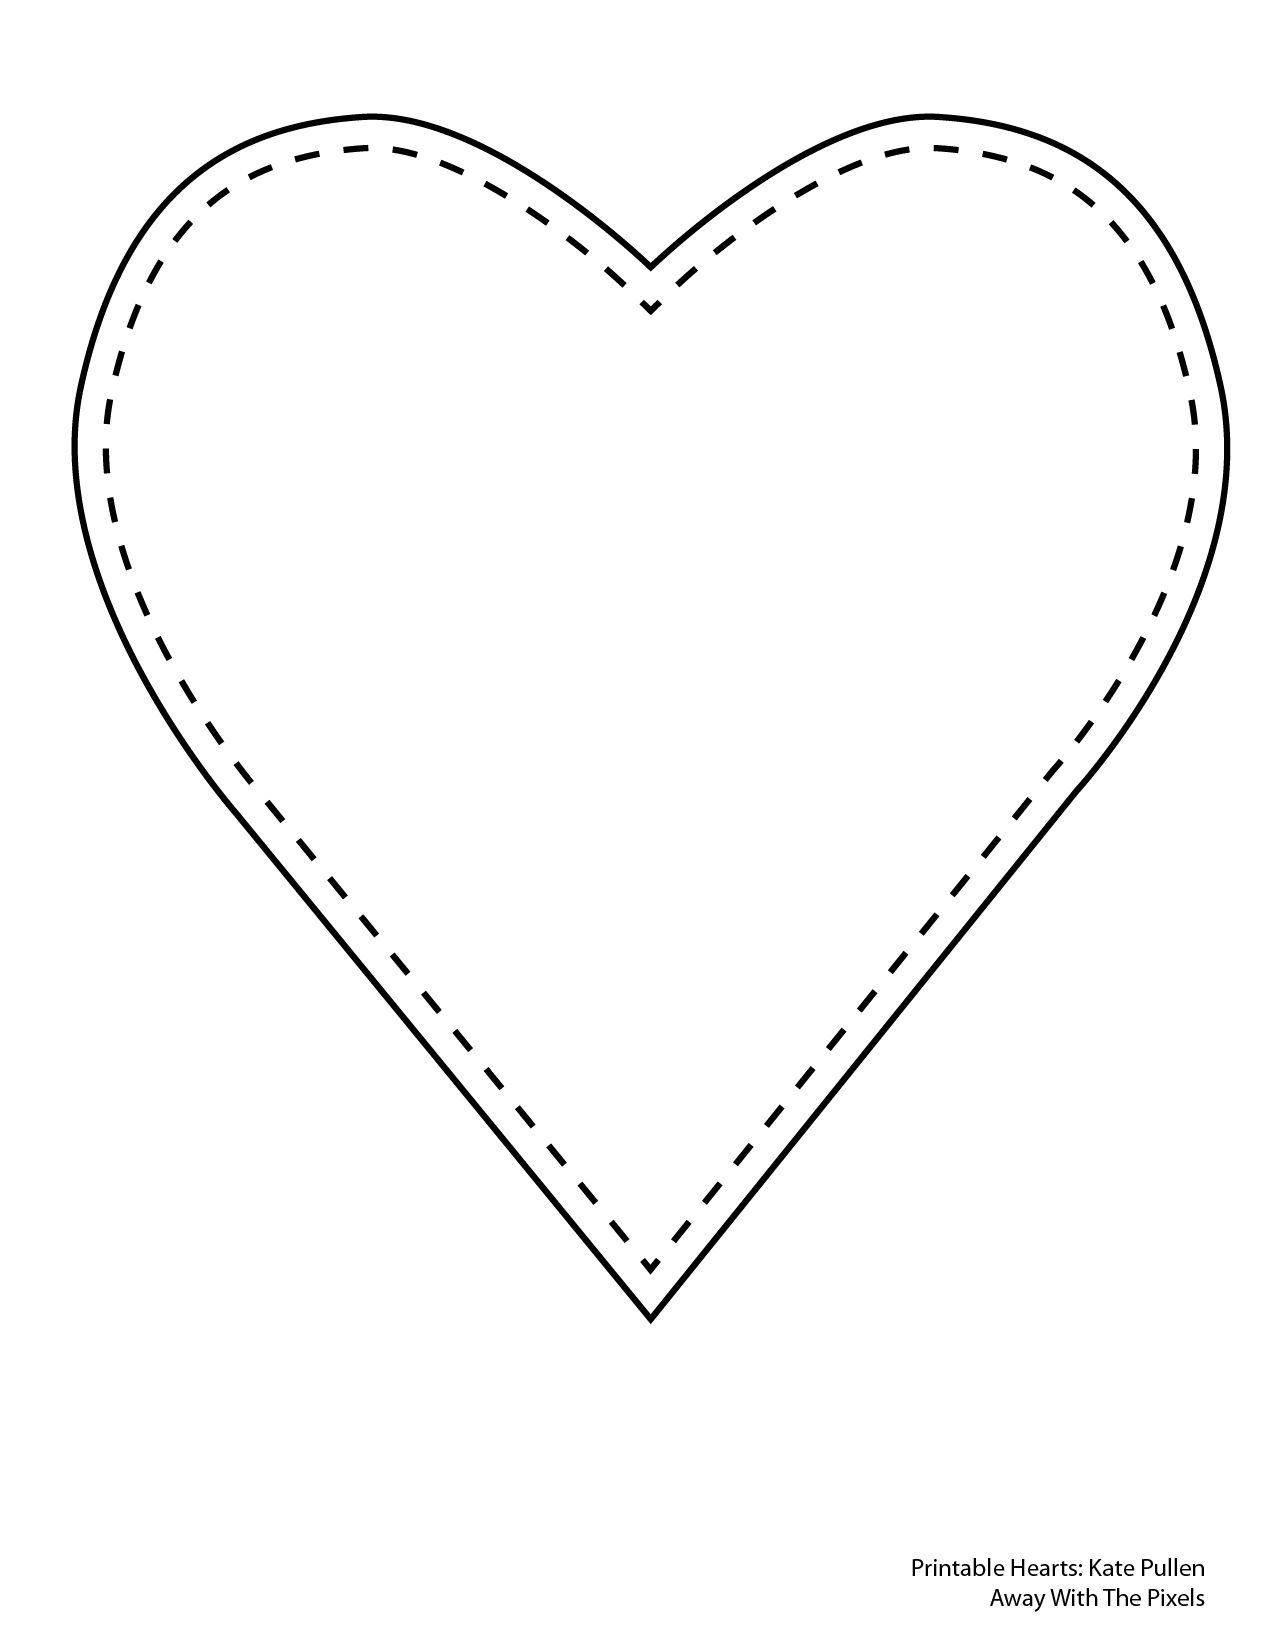 6 Free Printable Heart Templates - Free Printable Hearts